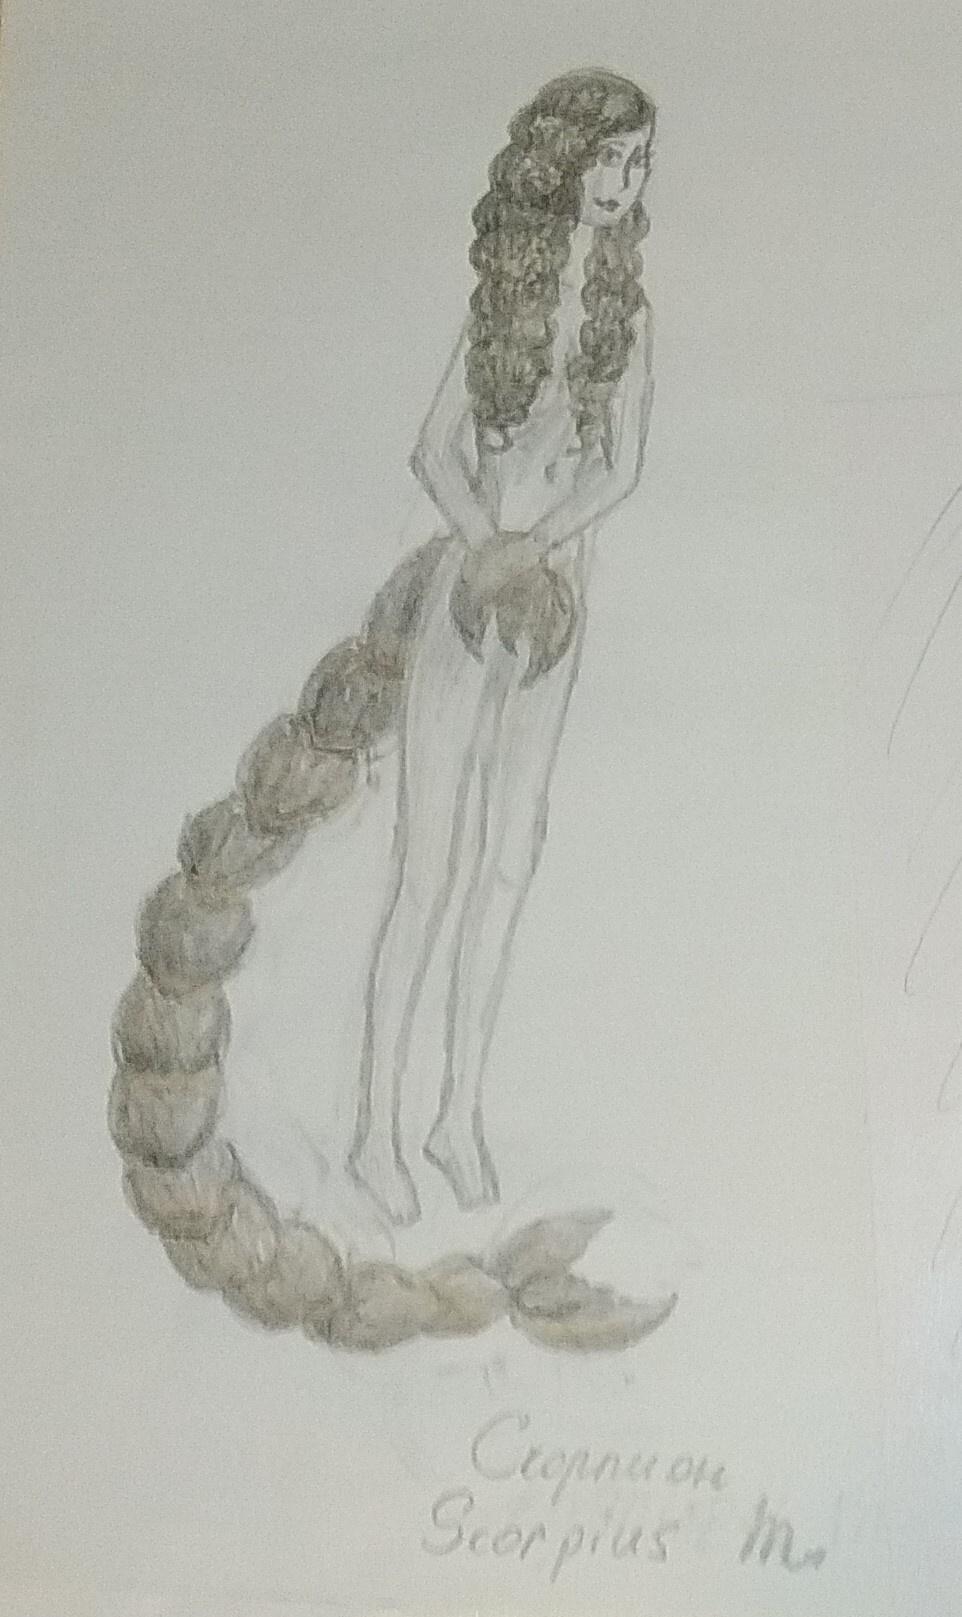 Zina Vladimirovna Parisva. Zodiac Signs: Scorpio